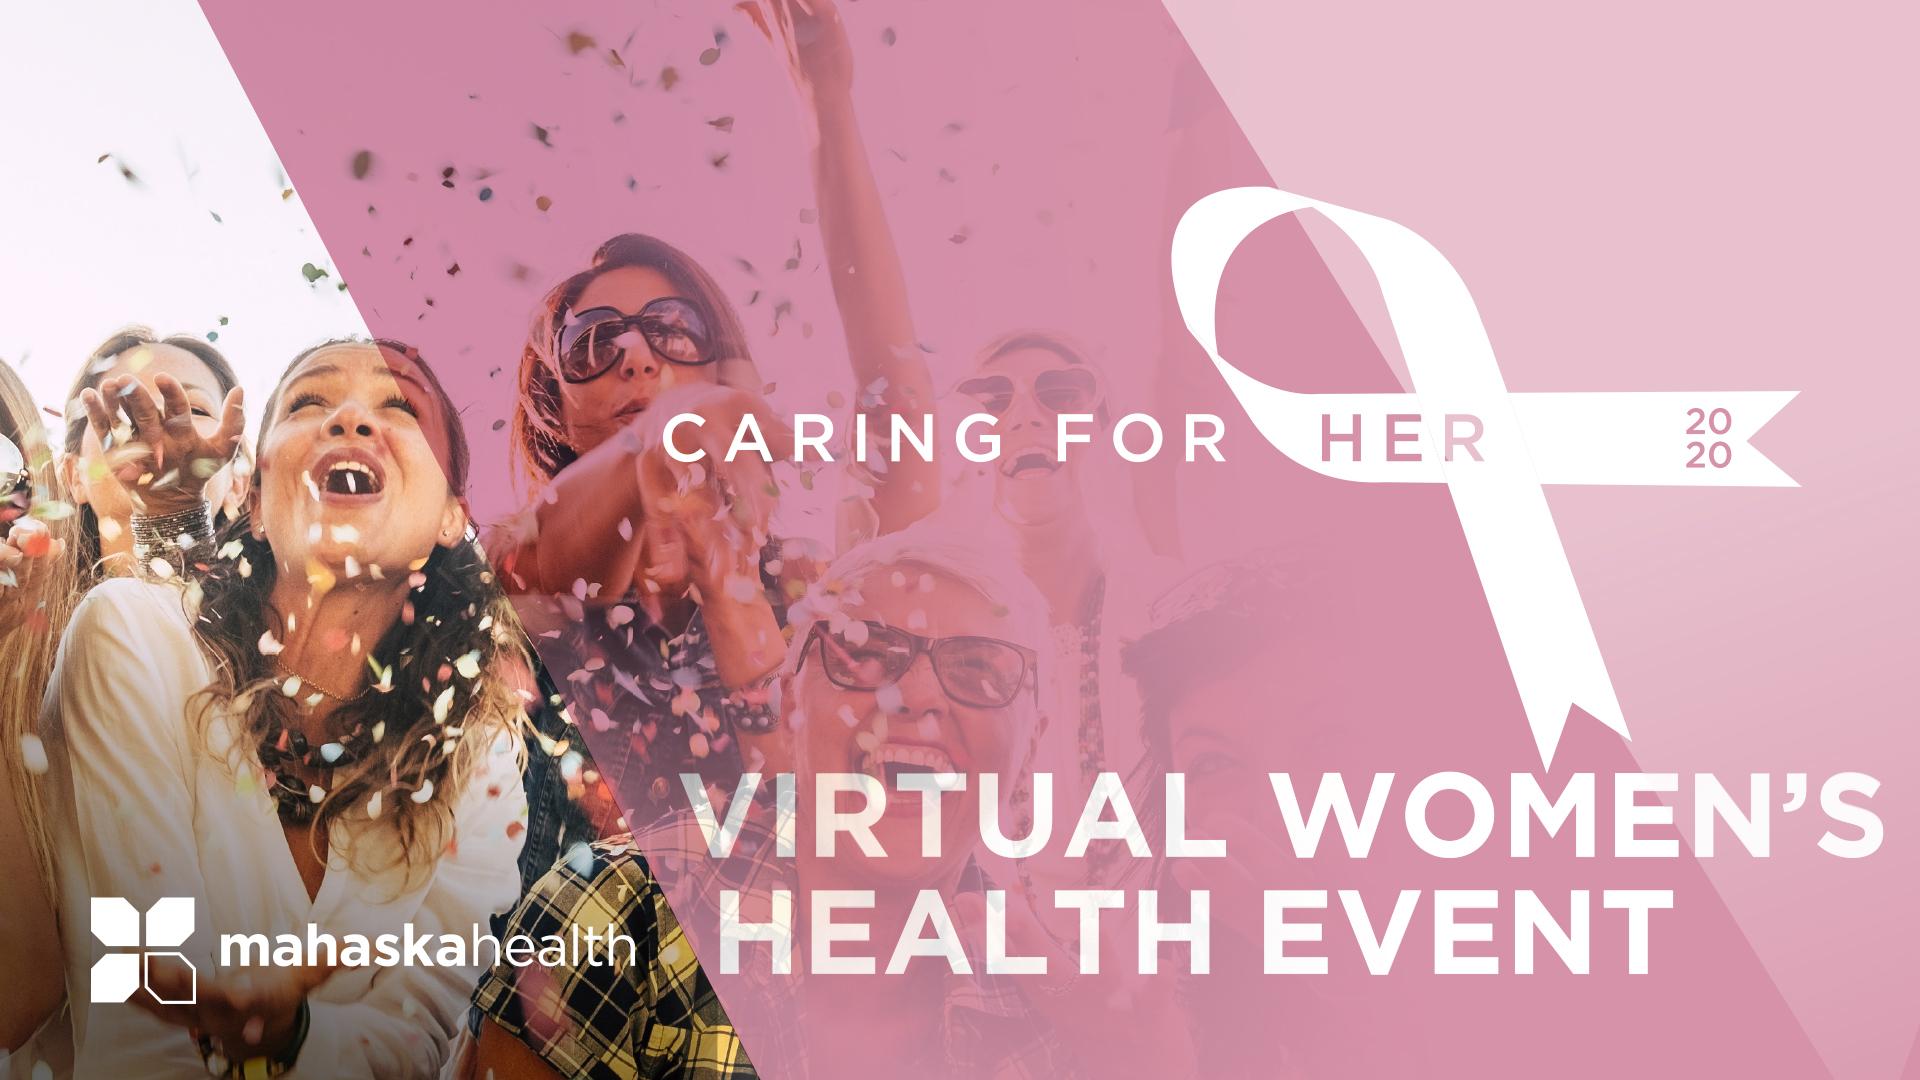 Women's Health Event 2020 1